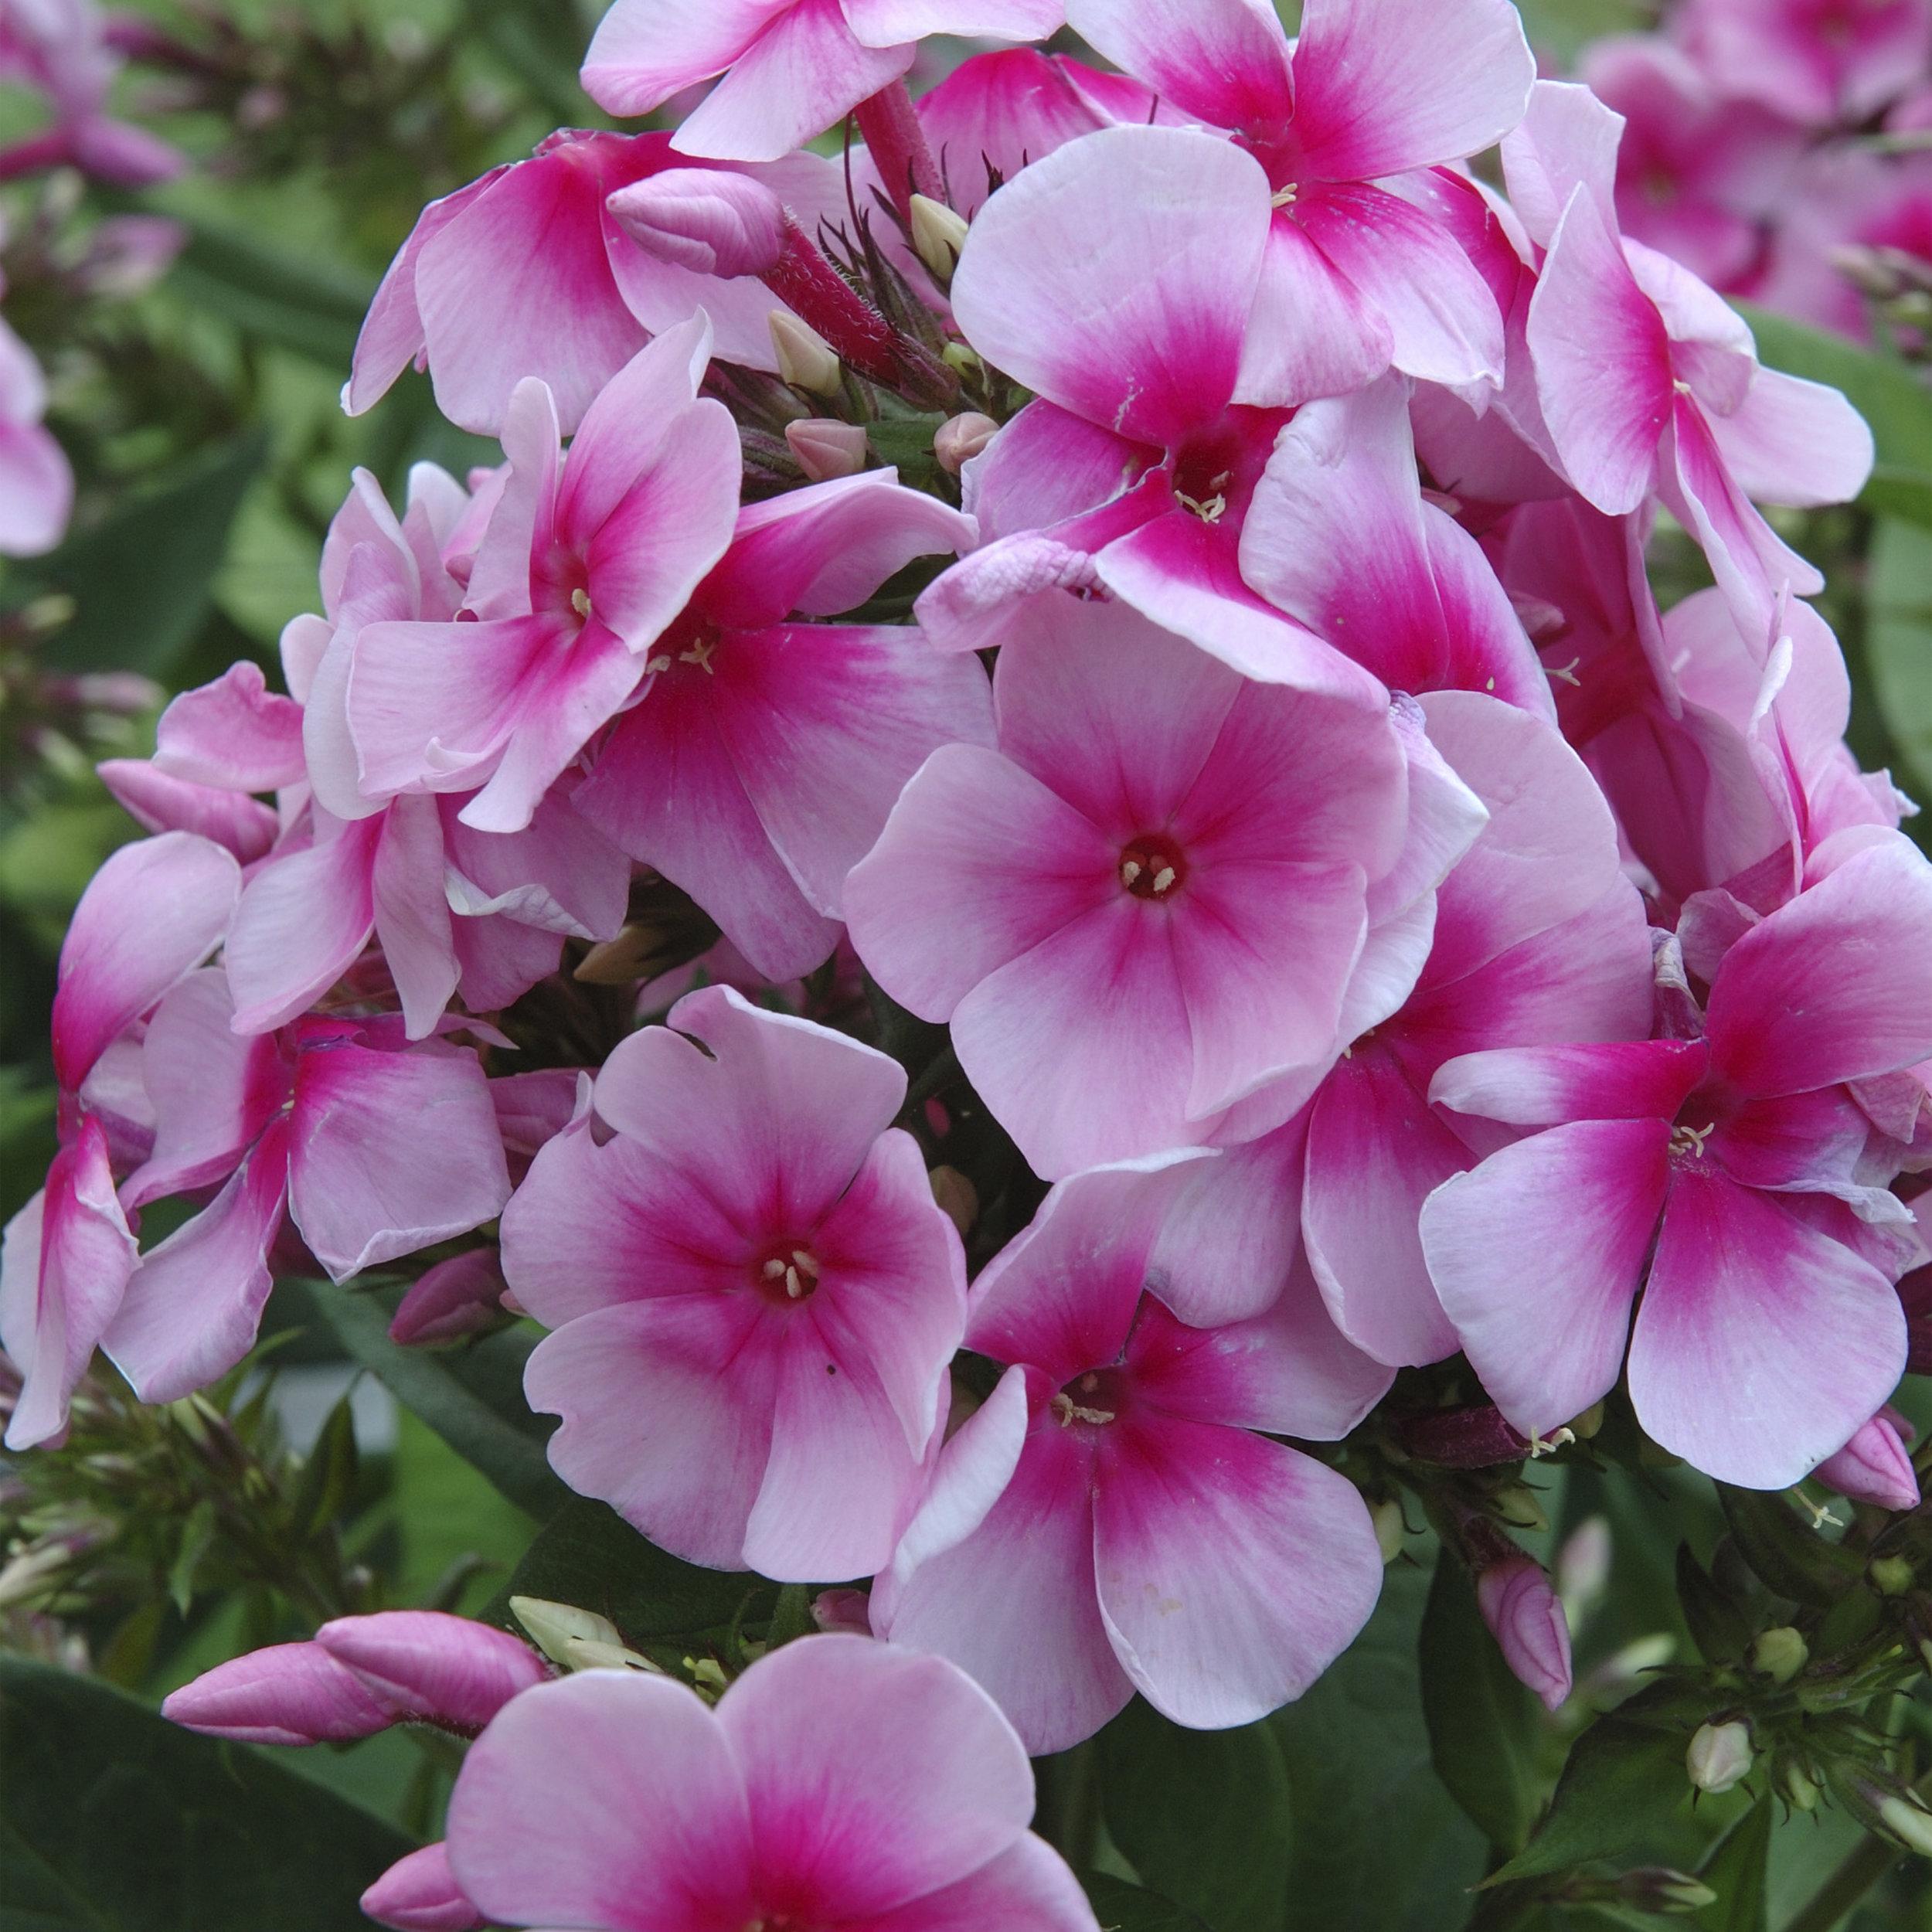 HR_Vegetative_Phlox_Sweet_Summer_Sweet_Summer_Festival__Compact_Rose_Dark_Eye_70028300_1.jpg